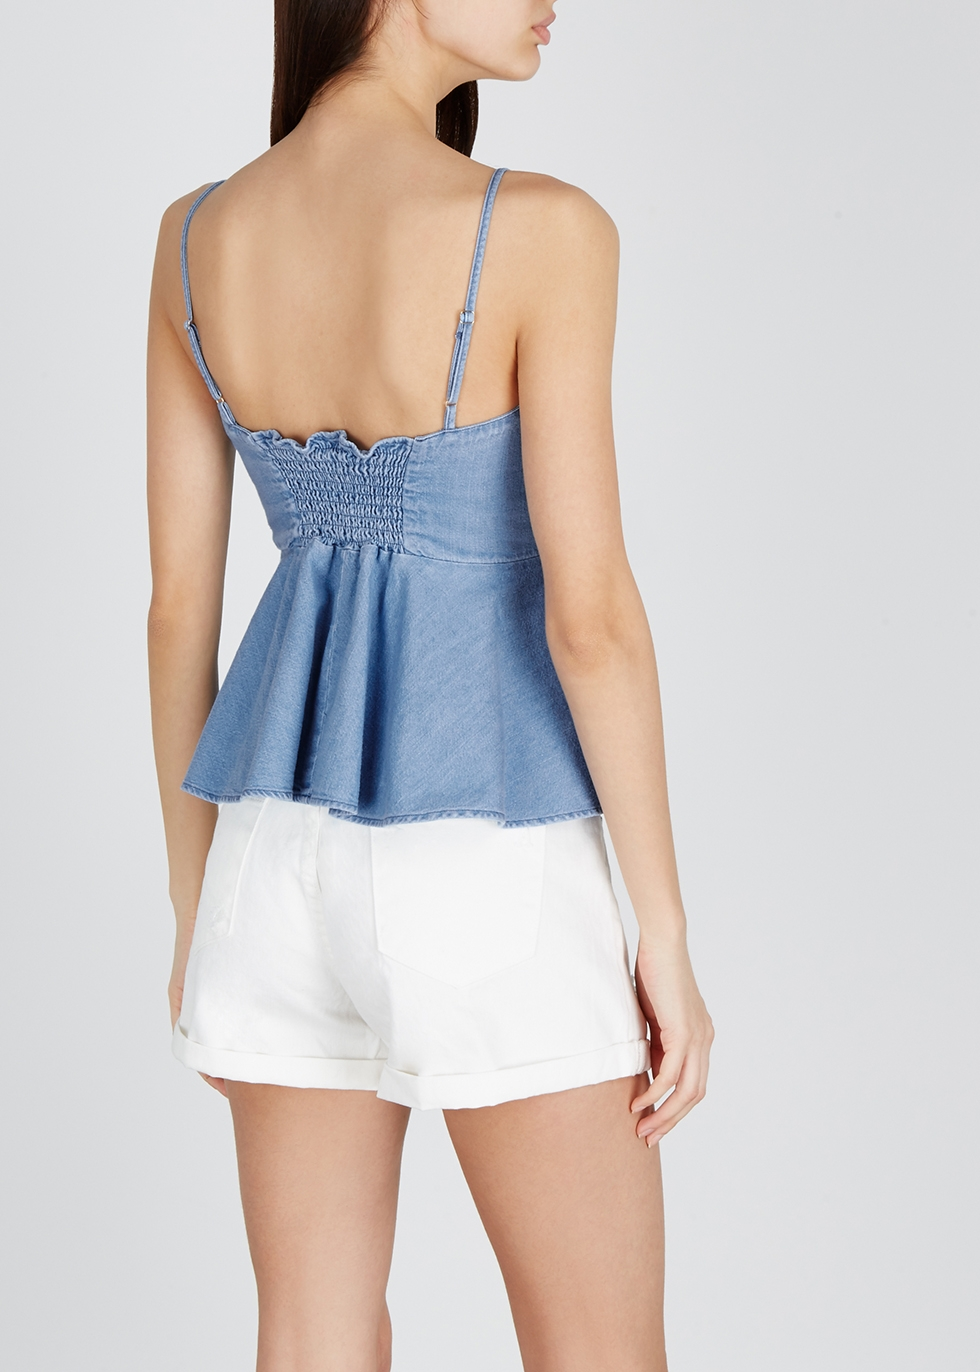 Senorita light blue denim top - Levi's Made & Crafted